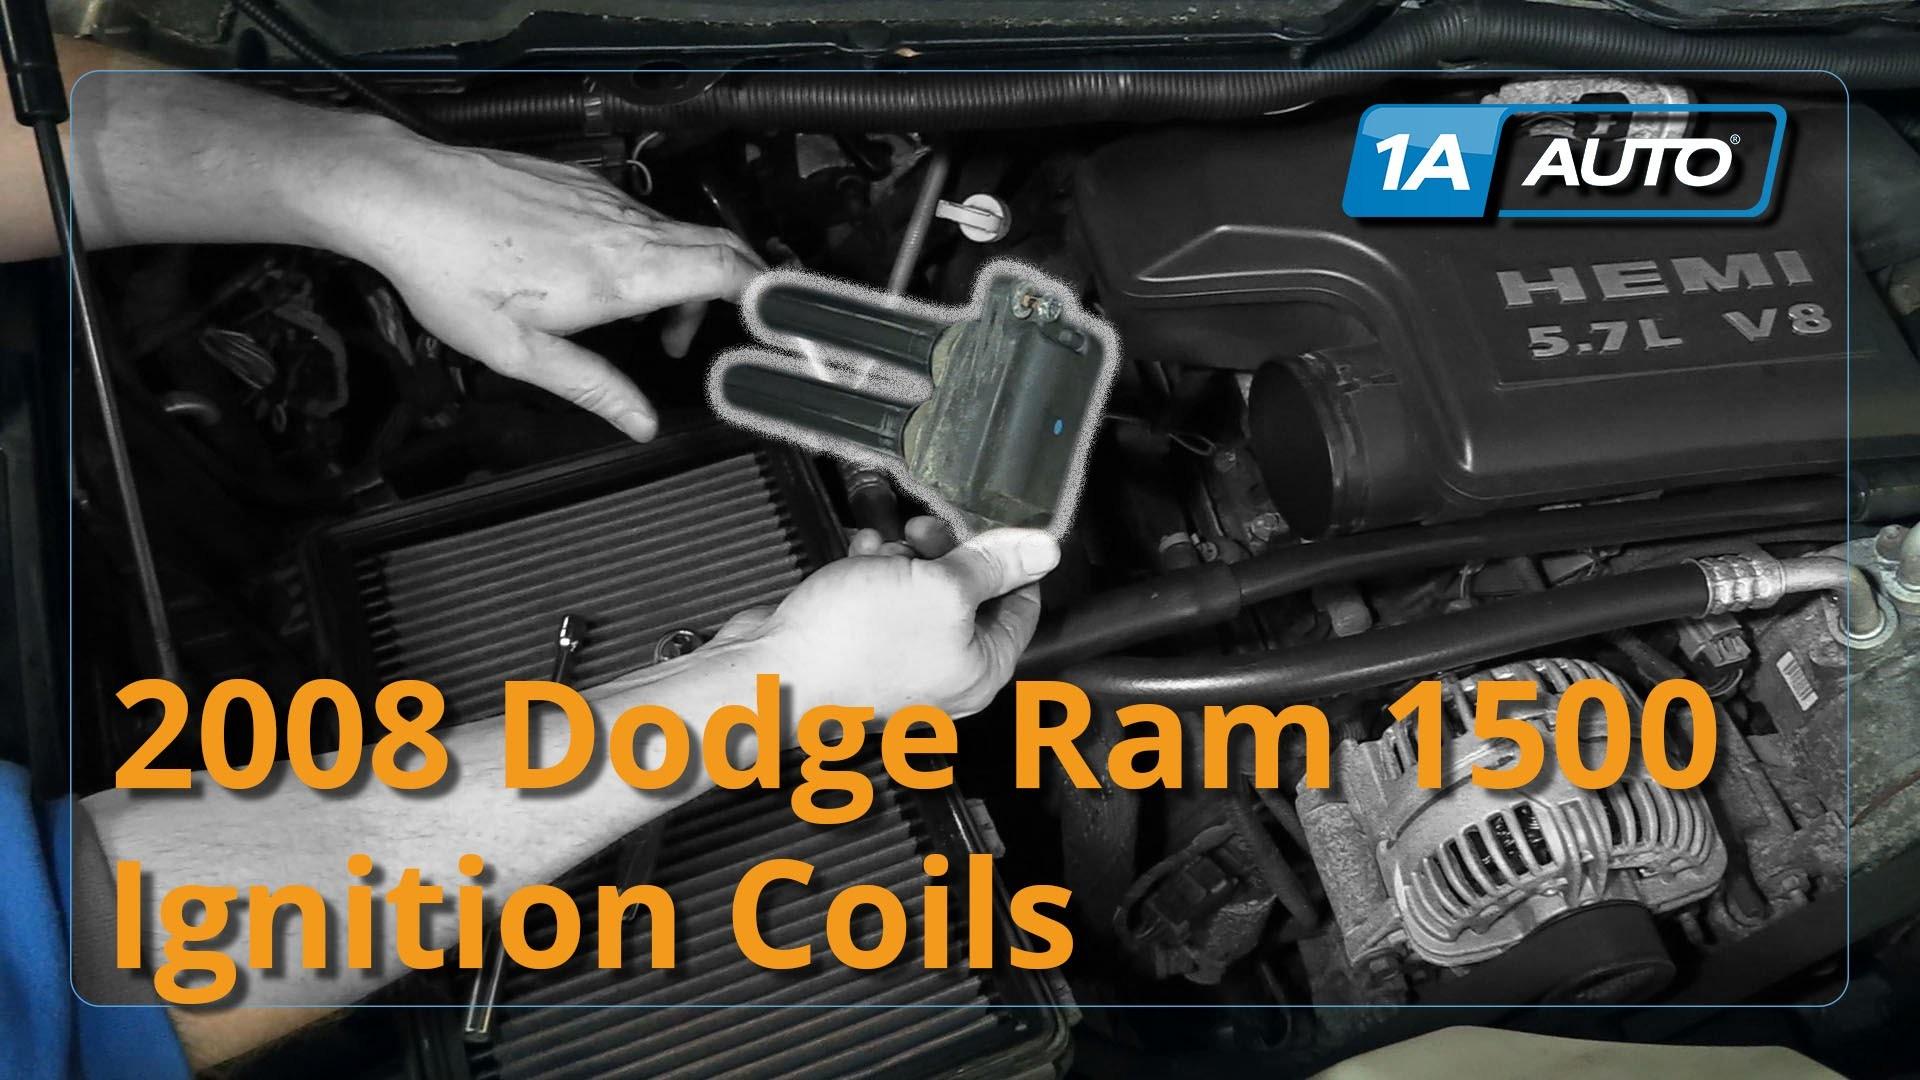 2003 Dodge Ram 1500 Engine Diagram How to Install Replace Ignition Coils Dodge Ram 1500 Hemi 5 7l Buy Of 2003 Dodge Ram 1500 Engine Diagram